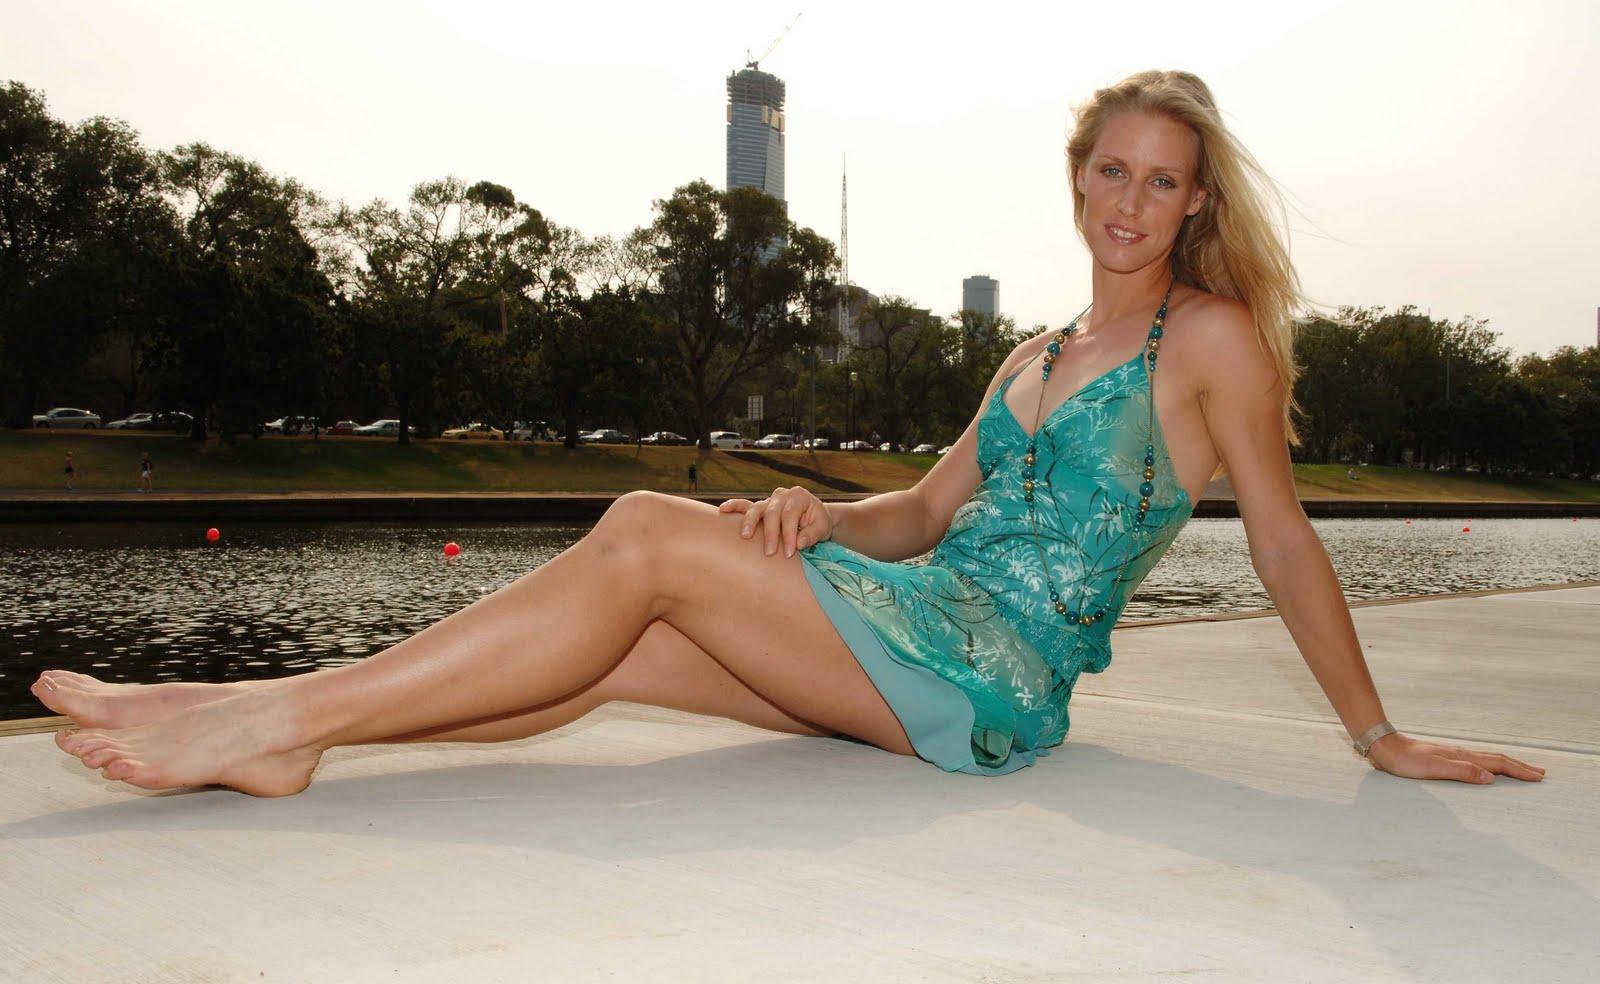 http://4.bp.blogspot.com/-d3hHv8ocM7I/UJJ5JzwqLxI/AAAAAAAAEYI/vqY4HGnGetc/s1600/Elena+Dementieva.jpg